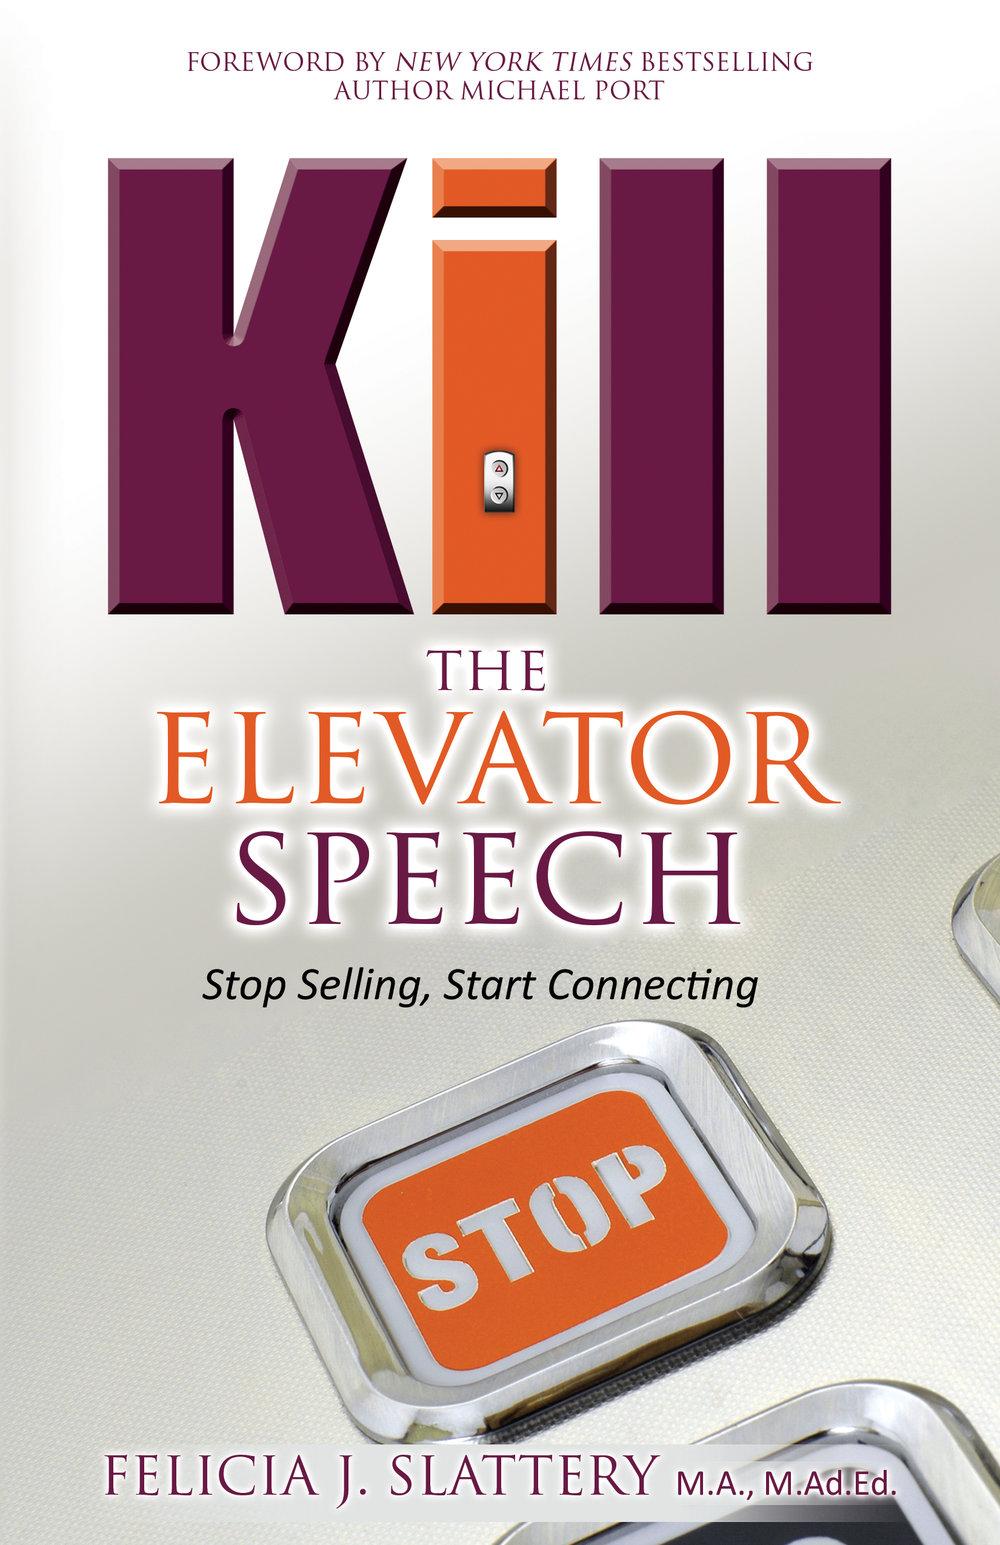 Kill the Elevator Speech - By felicia j. slattery m.a., m.ad.ed.